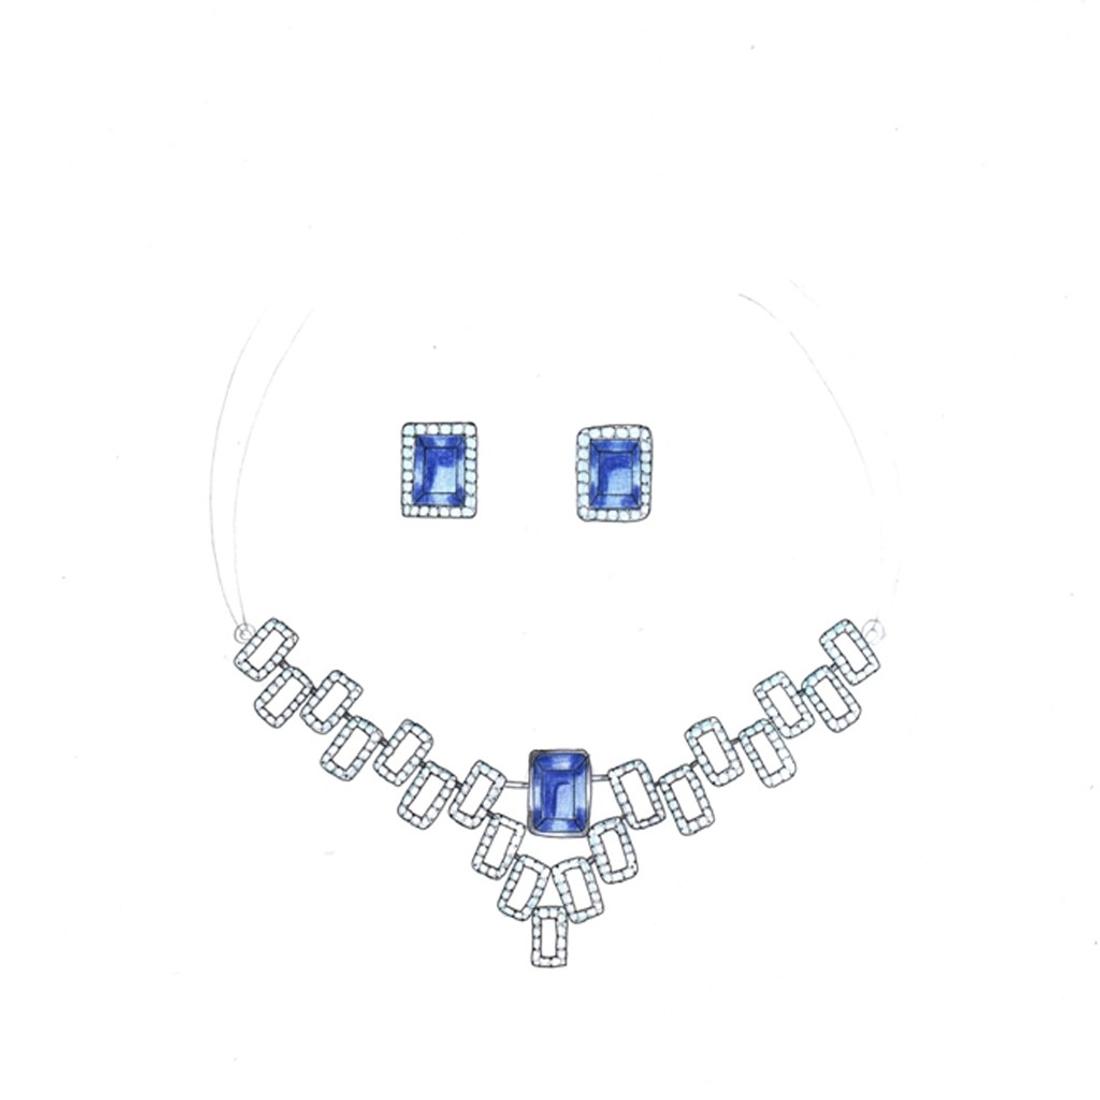 Sarvada Jewels' The Celestial Necklace Set